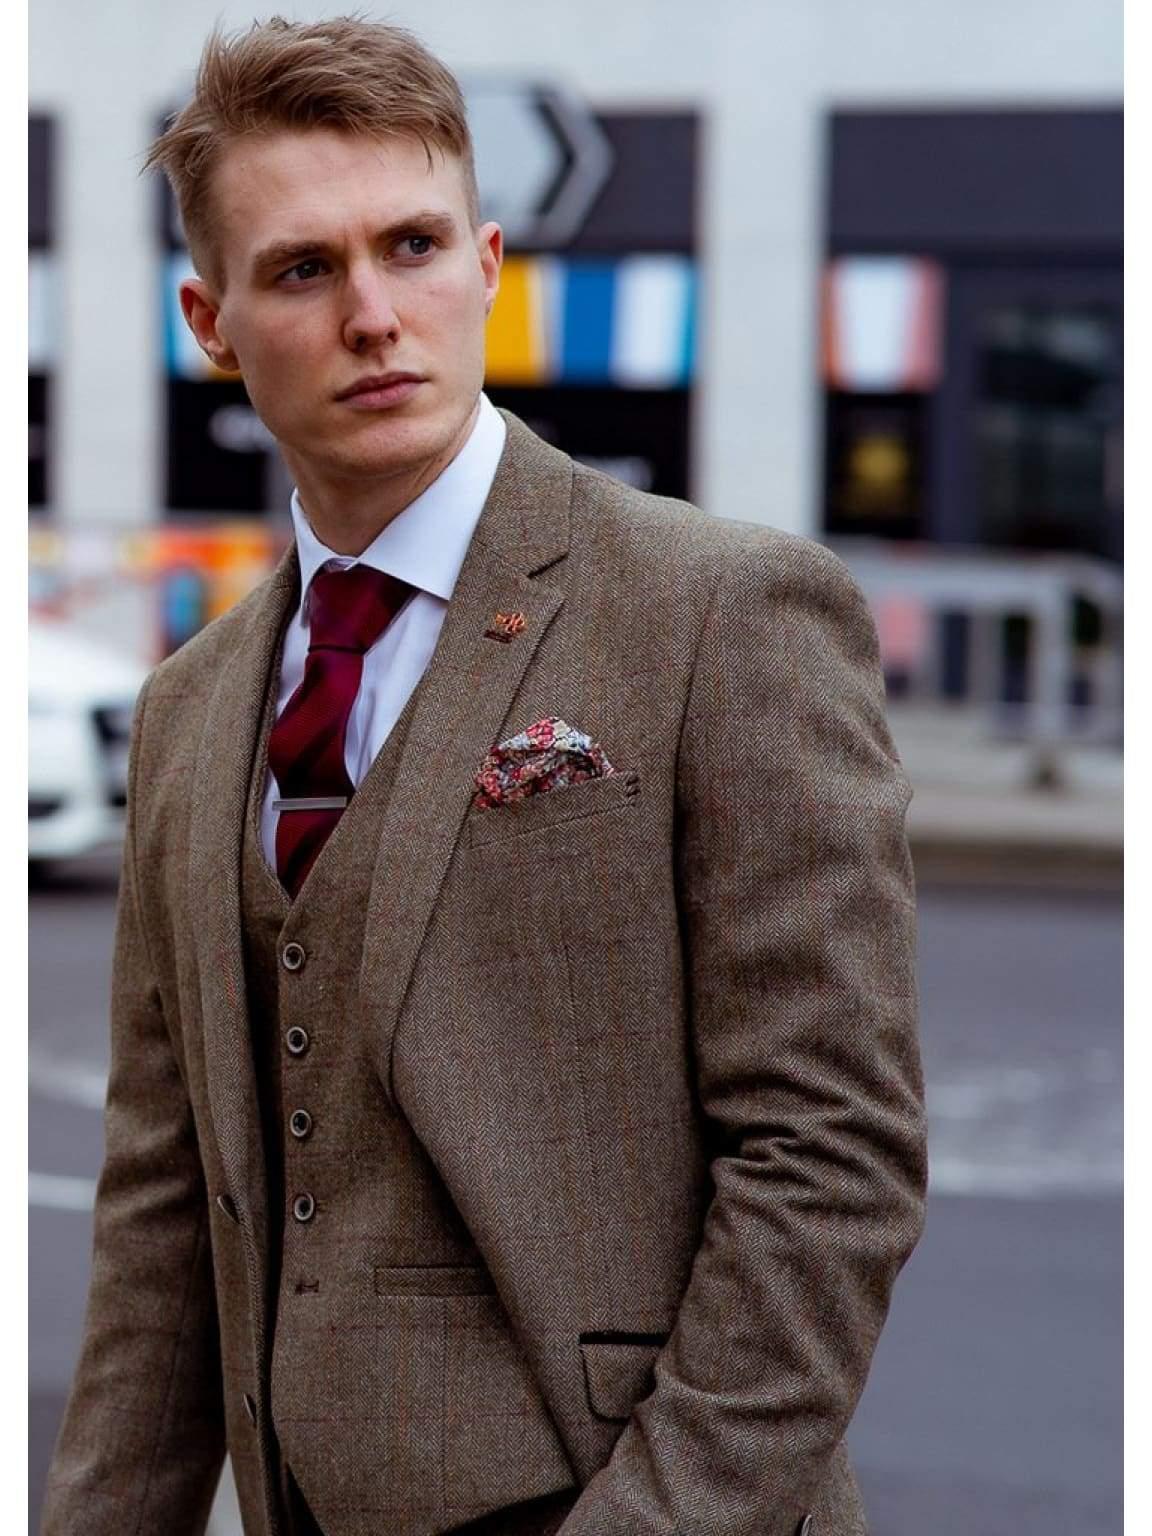 Sage Green Three Piece Check Slim Fit Tweed Suit Gaston by Cavani - Suit & Tailoring